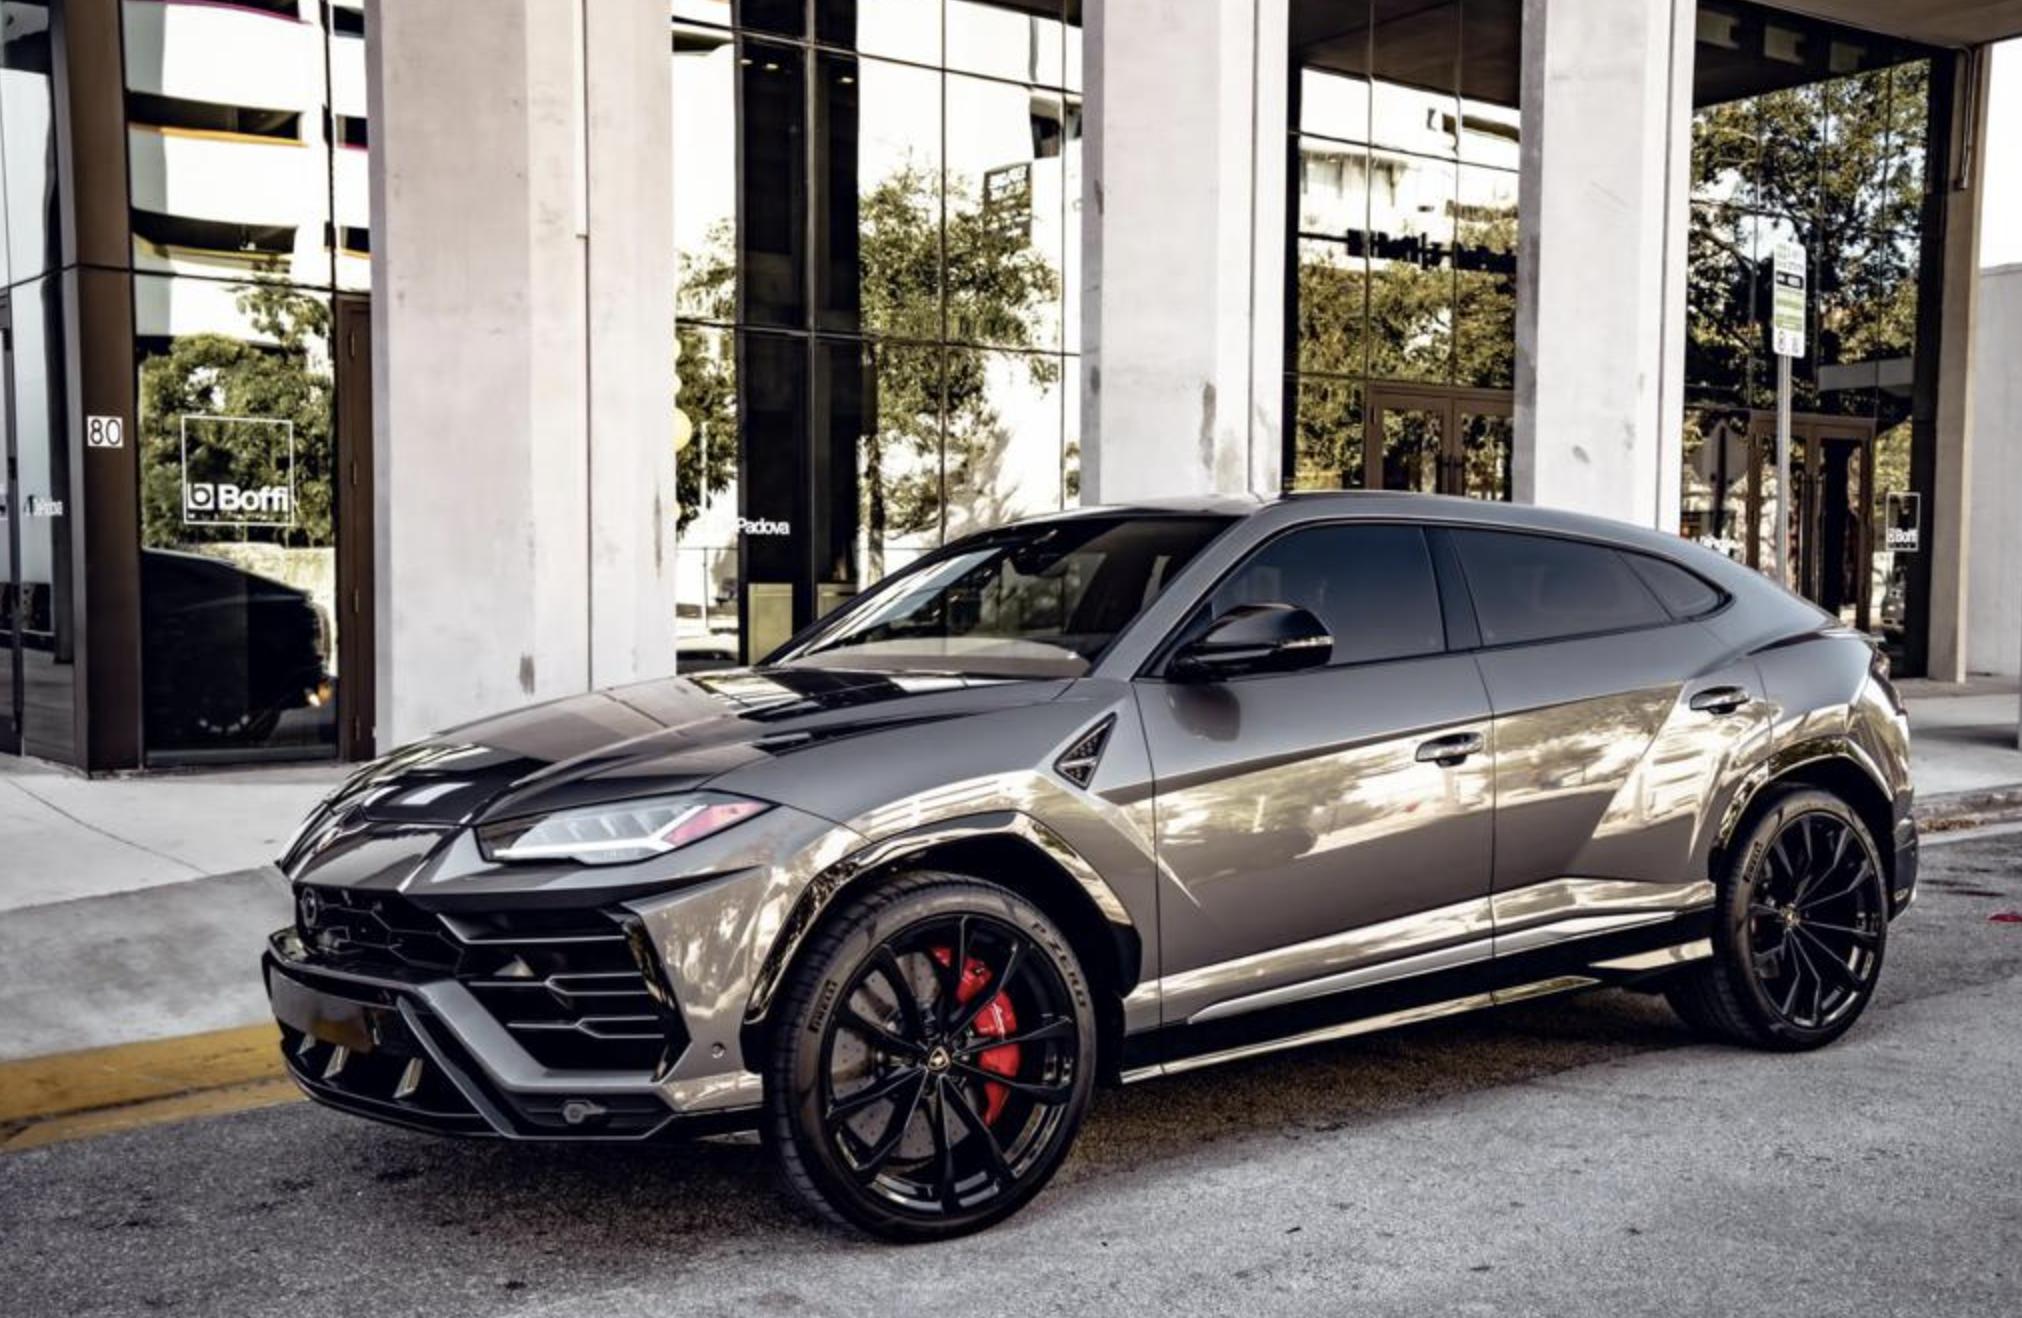 Image #2 of our  2021 Lamborghini Urus - Silver    In Miami Fort Lauderdale Palm Beach South Florida